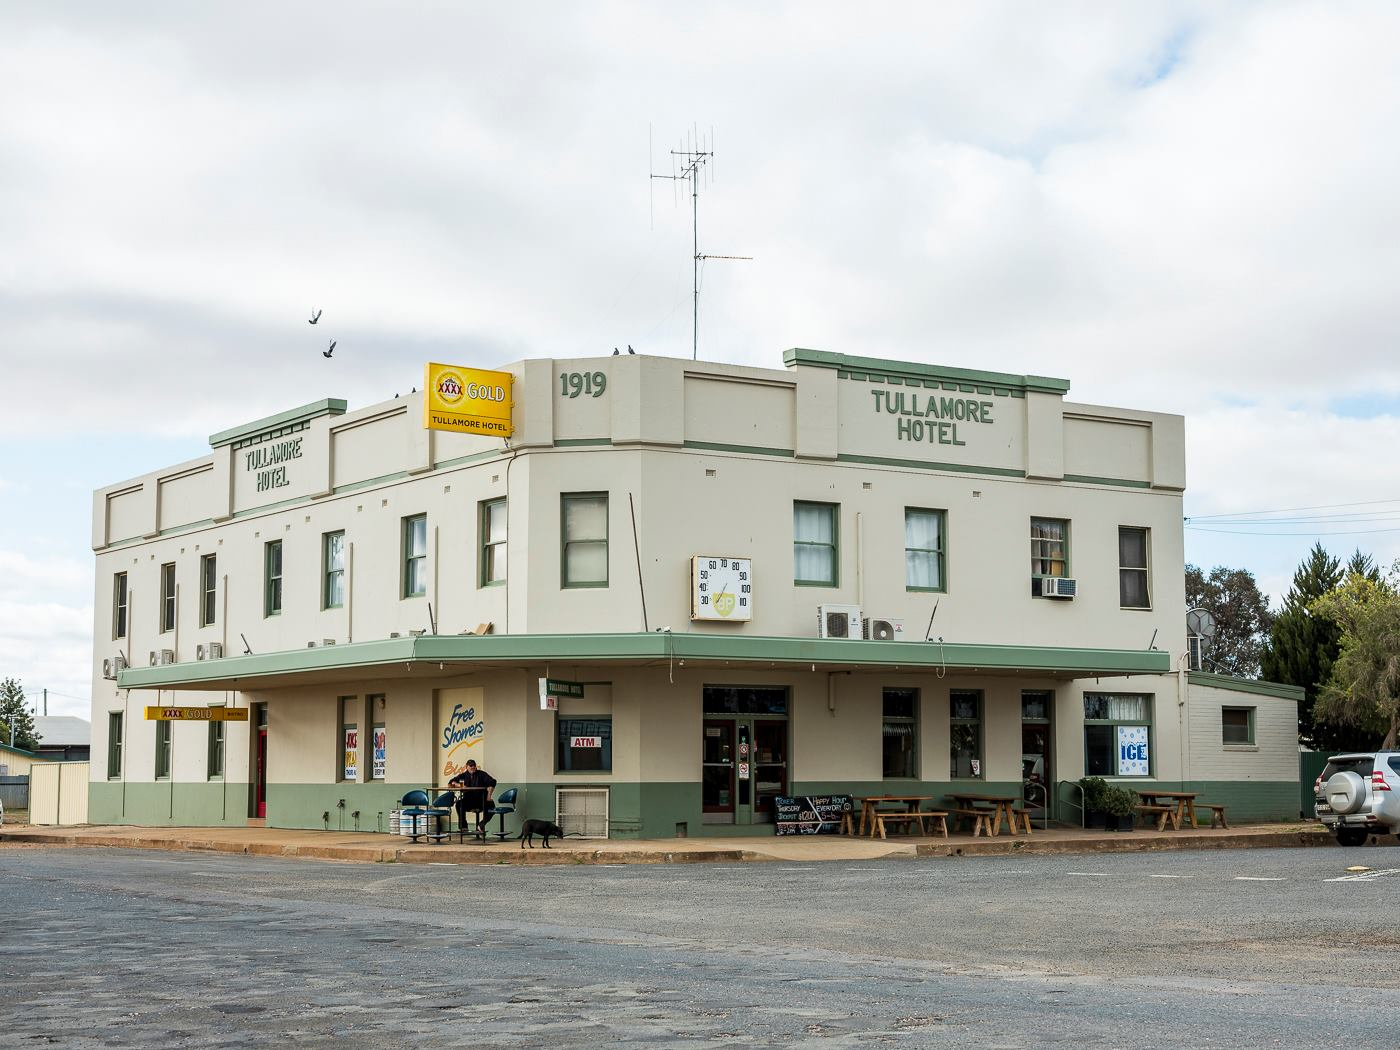 The Tullamore Hotel